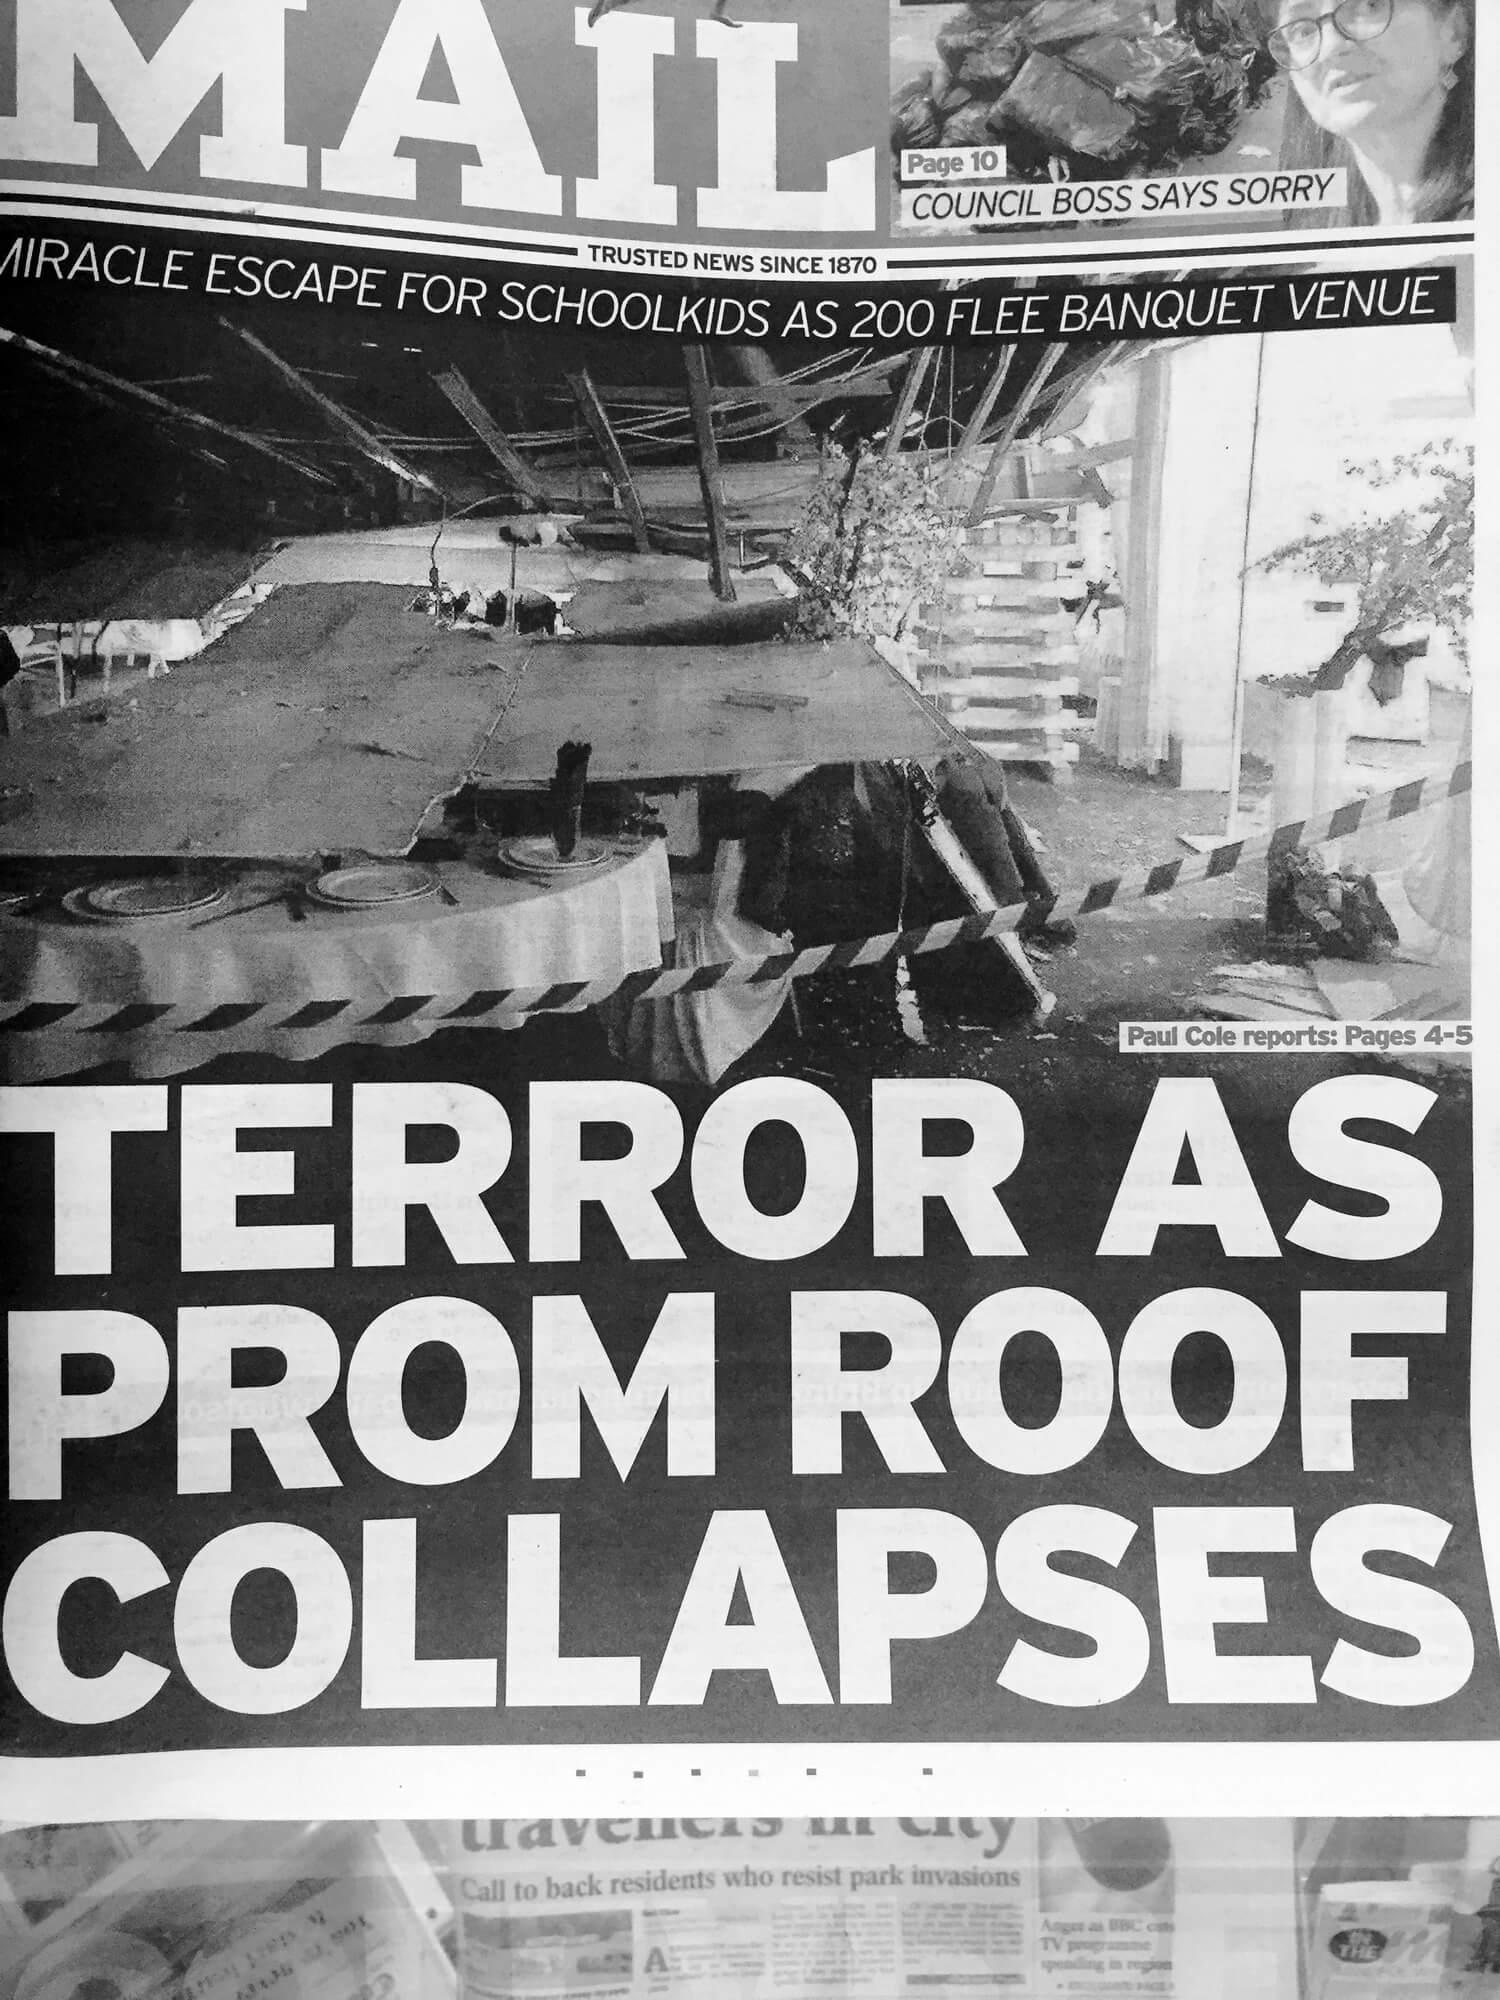 Venue collapses!